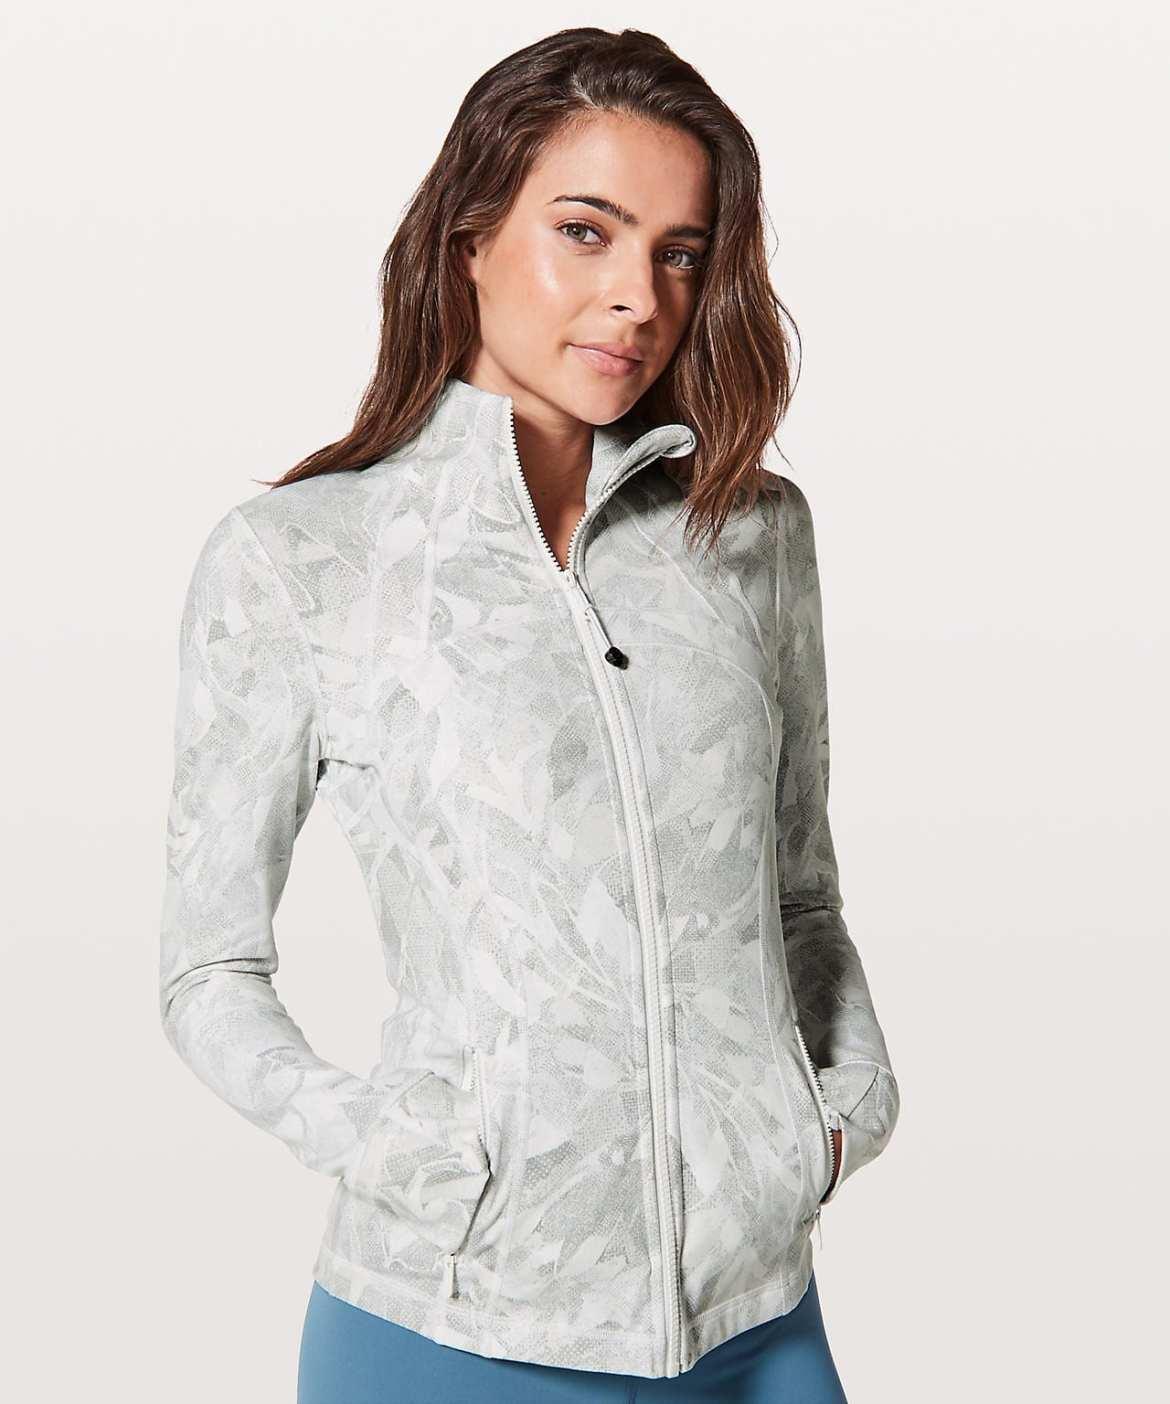 Define Jacket Jasmine White Multi